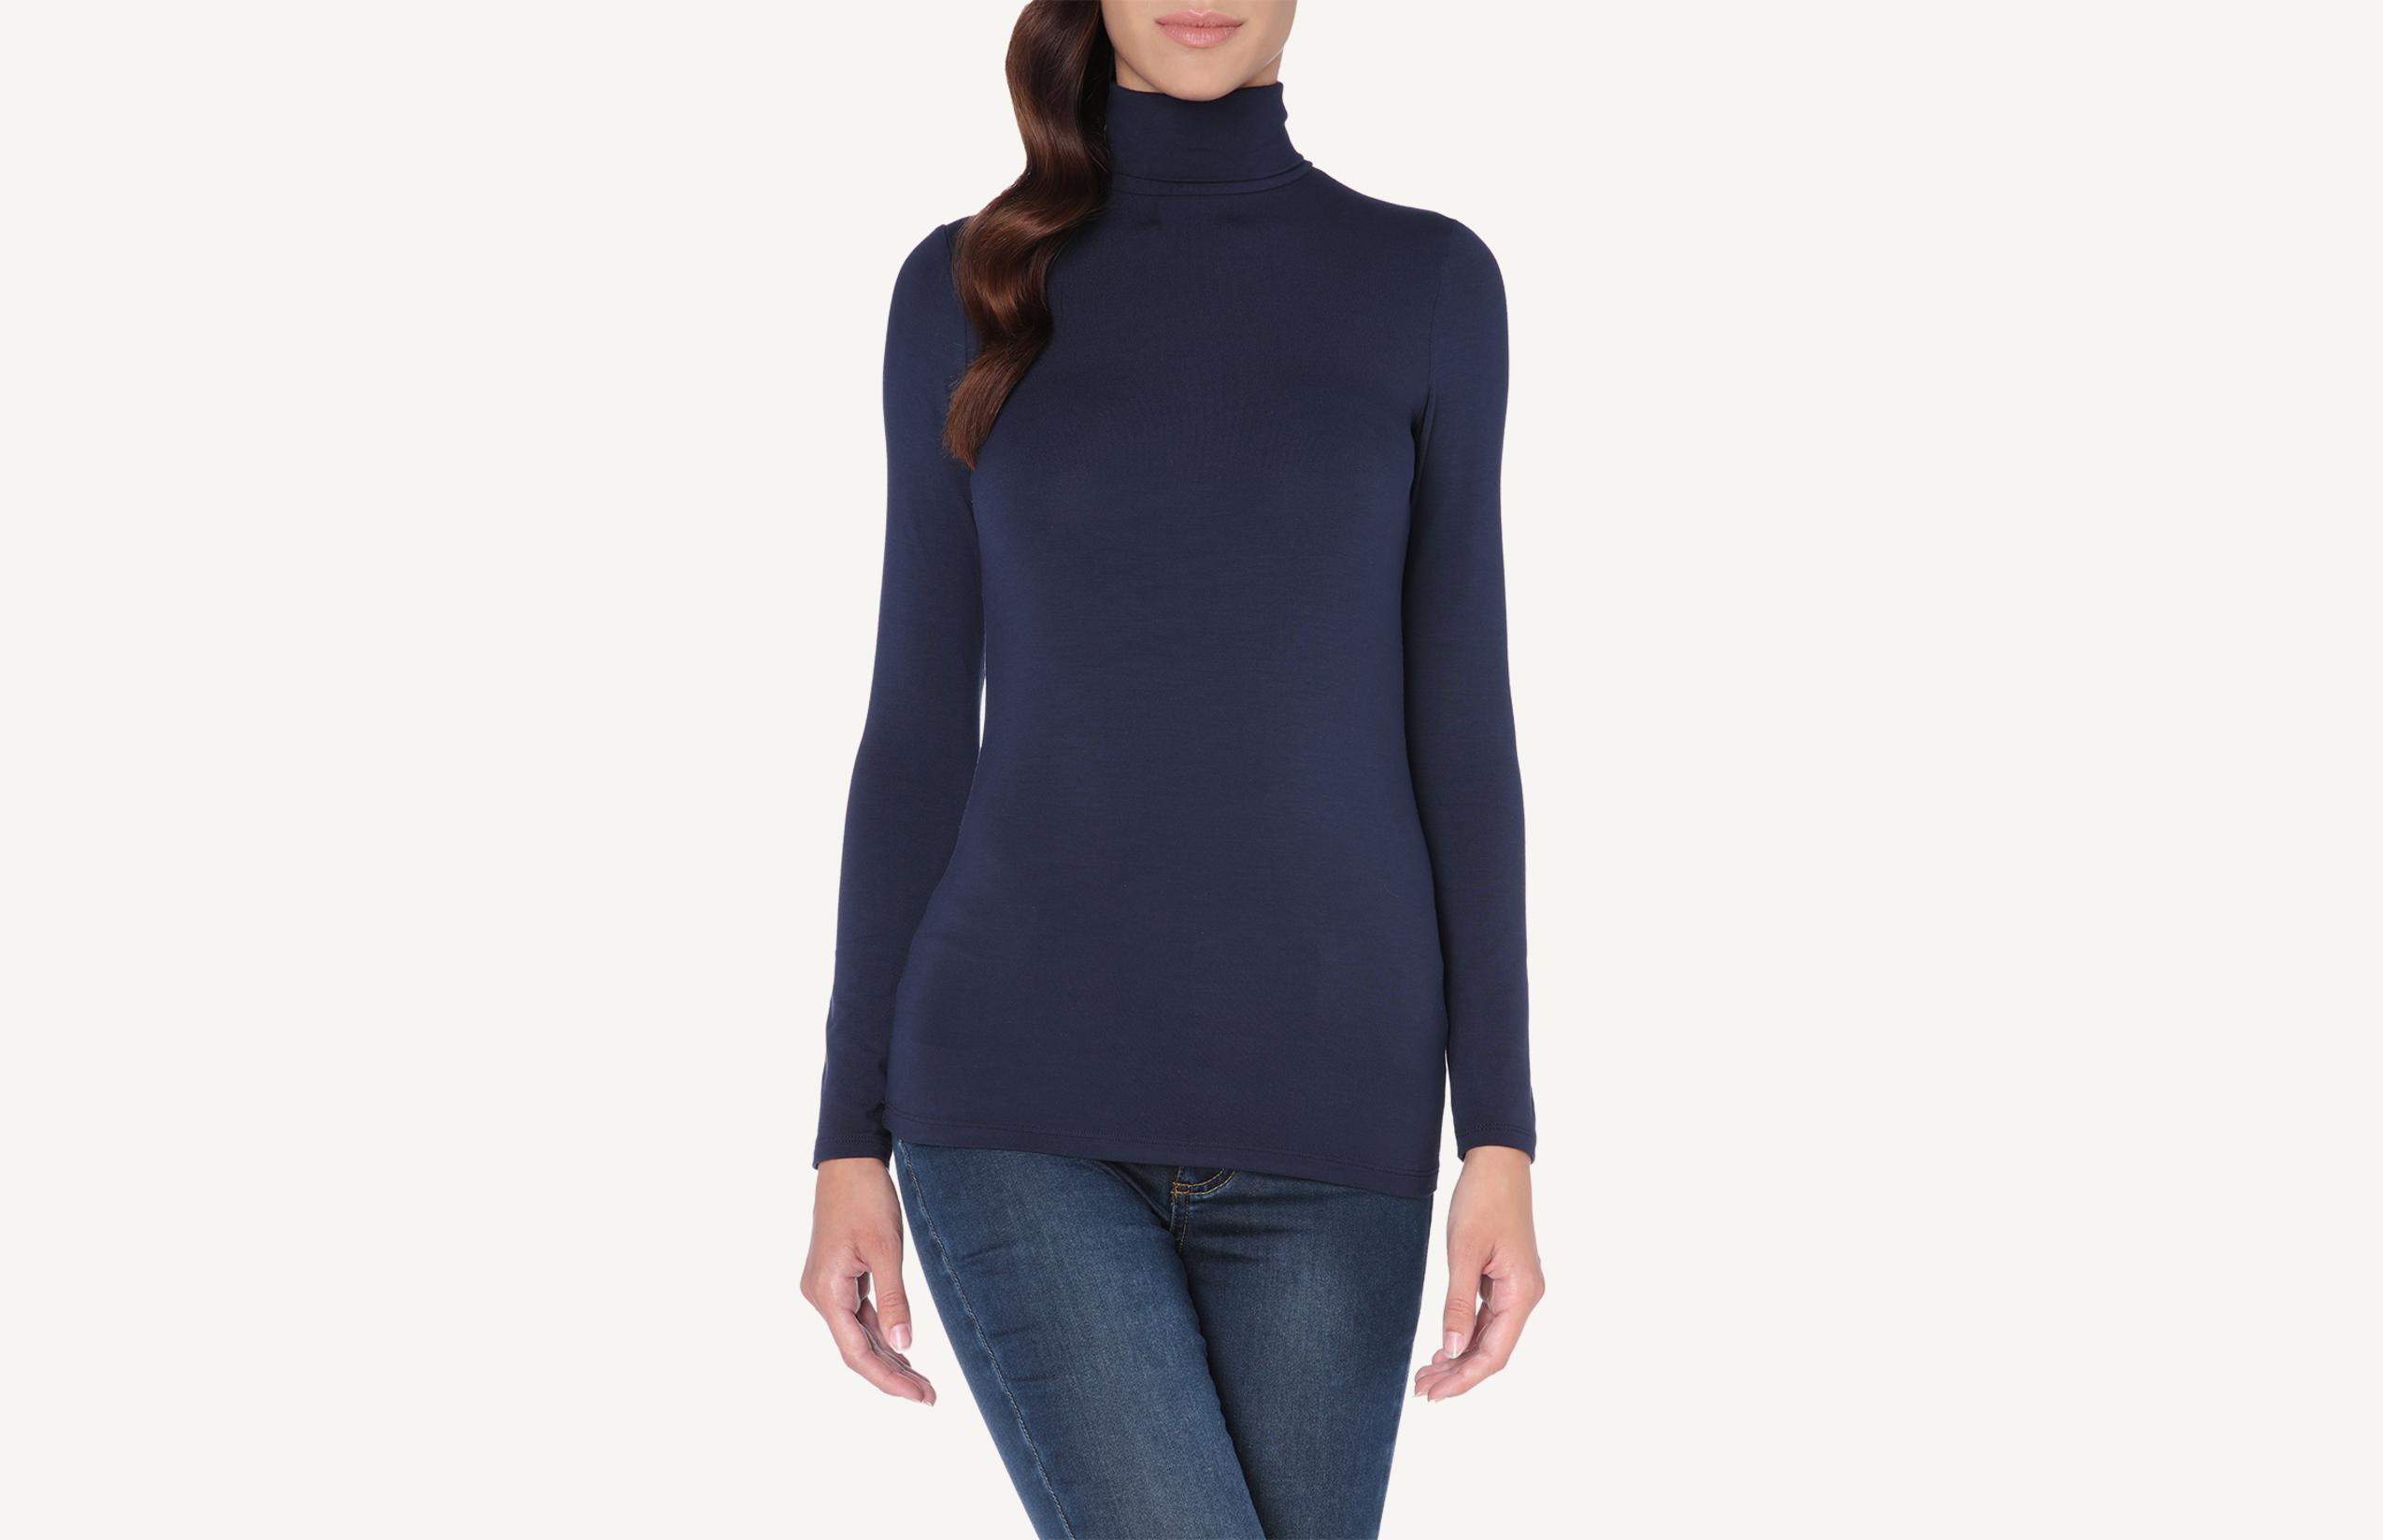 intimissimi - Langarm-Shirt aus Mikromodal mit Rollkragen